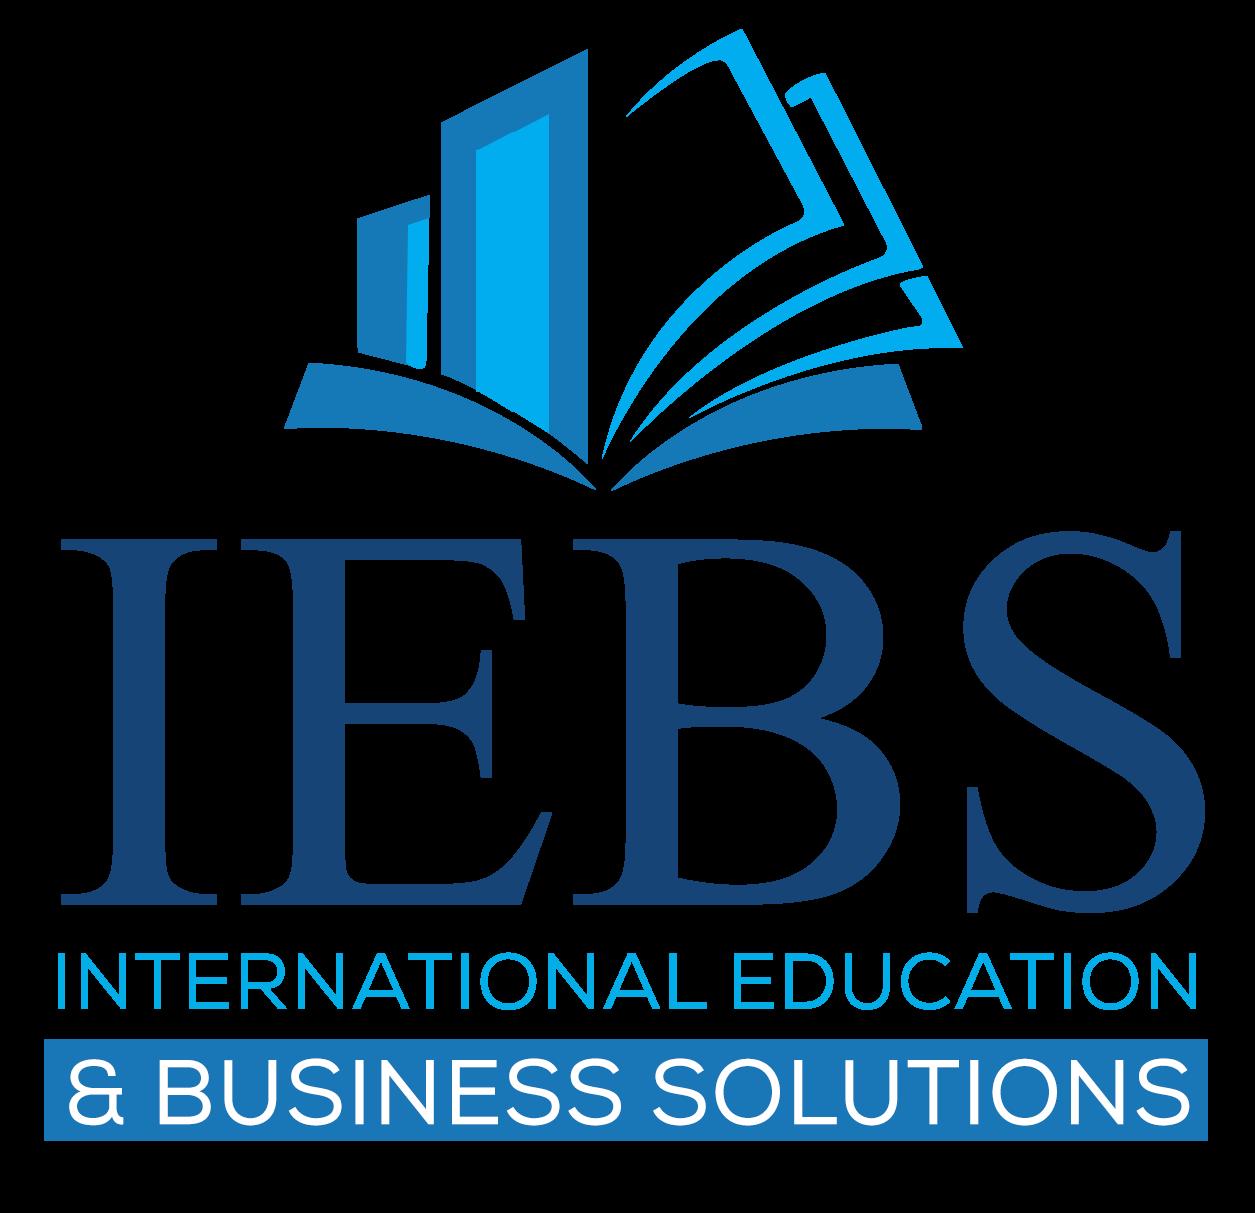 IEBS Limited